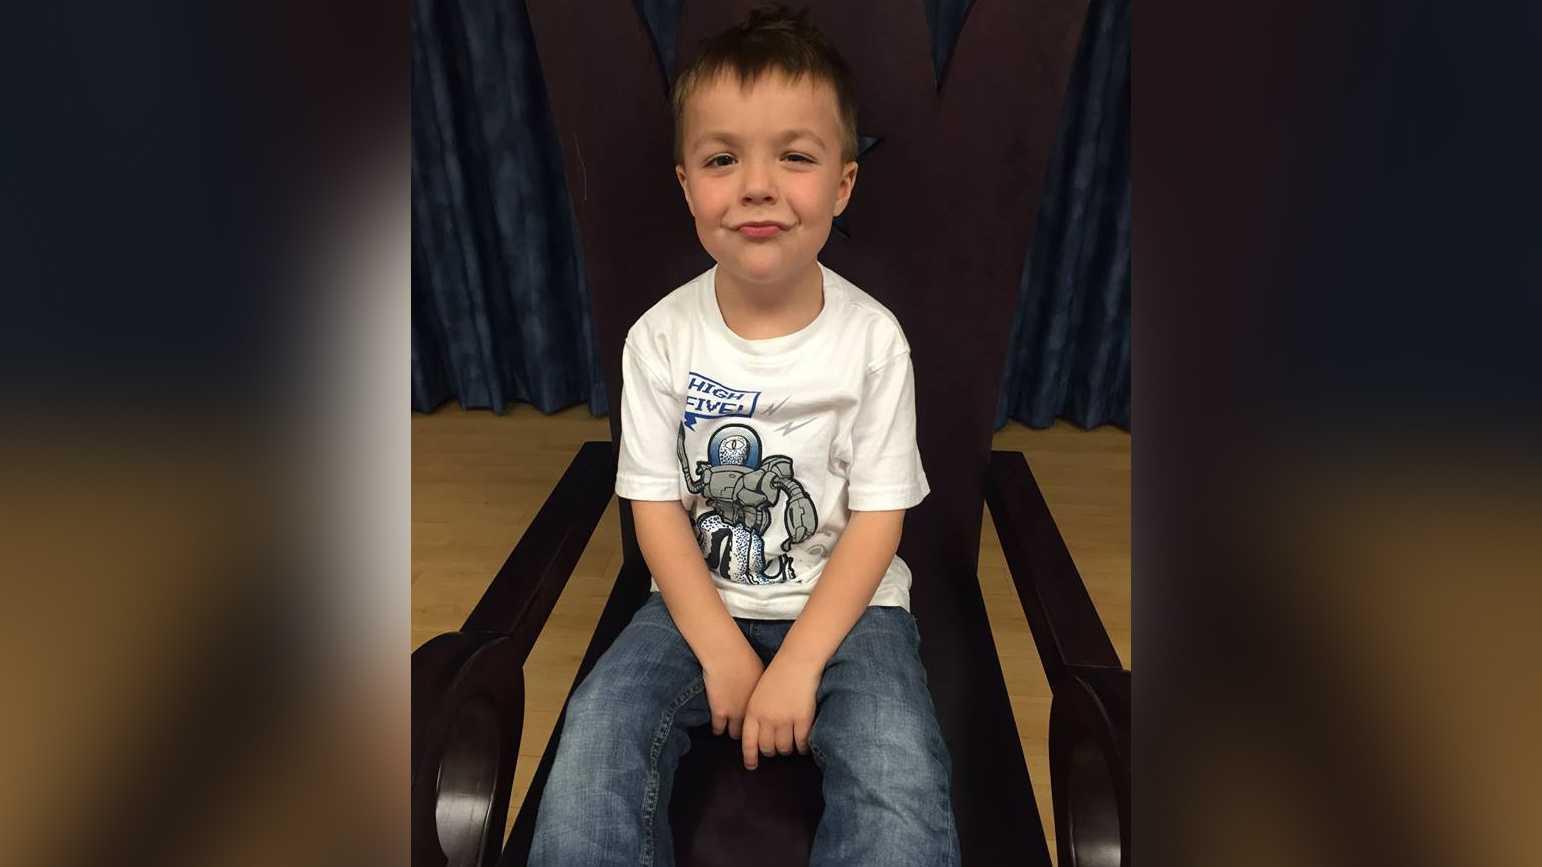 Ethan Dean, 6, is battling cystic fibrosis